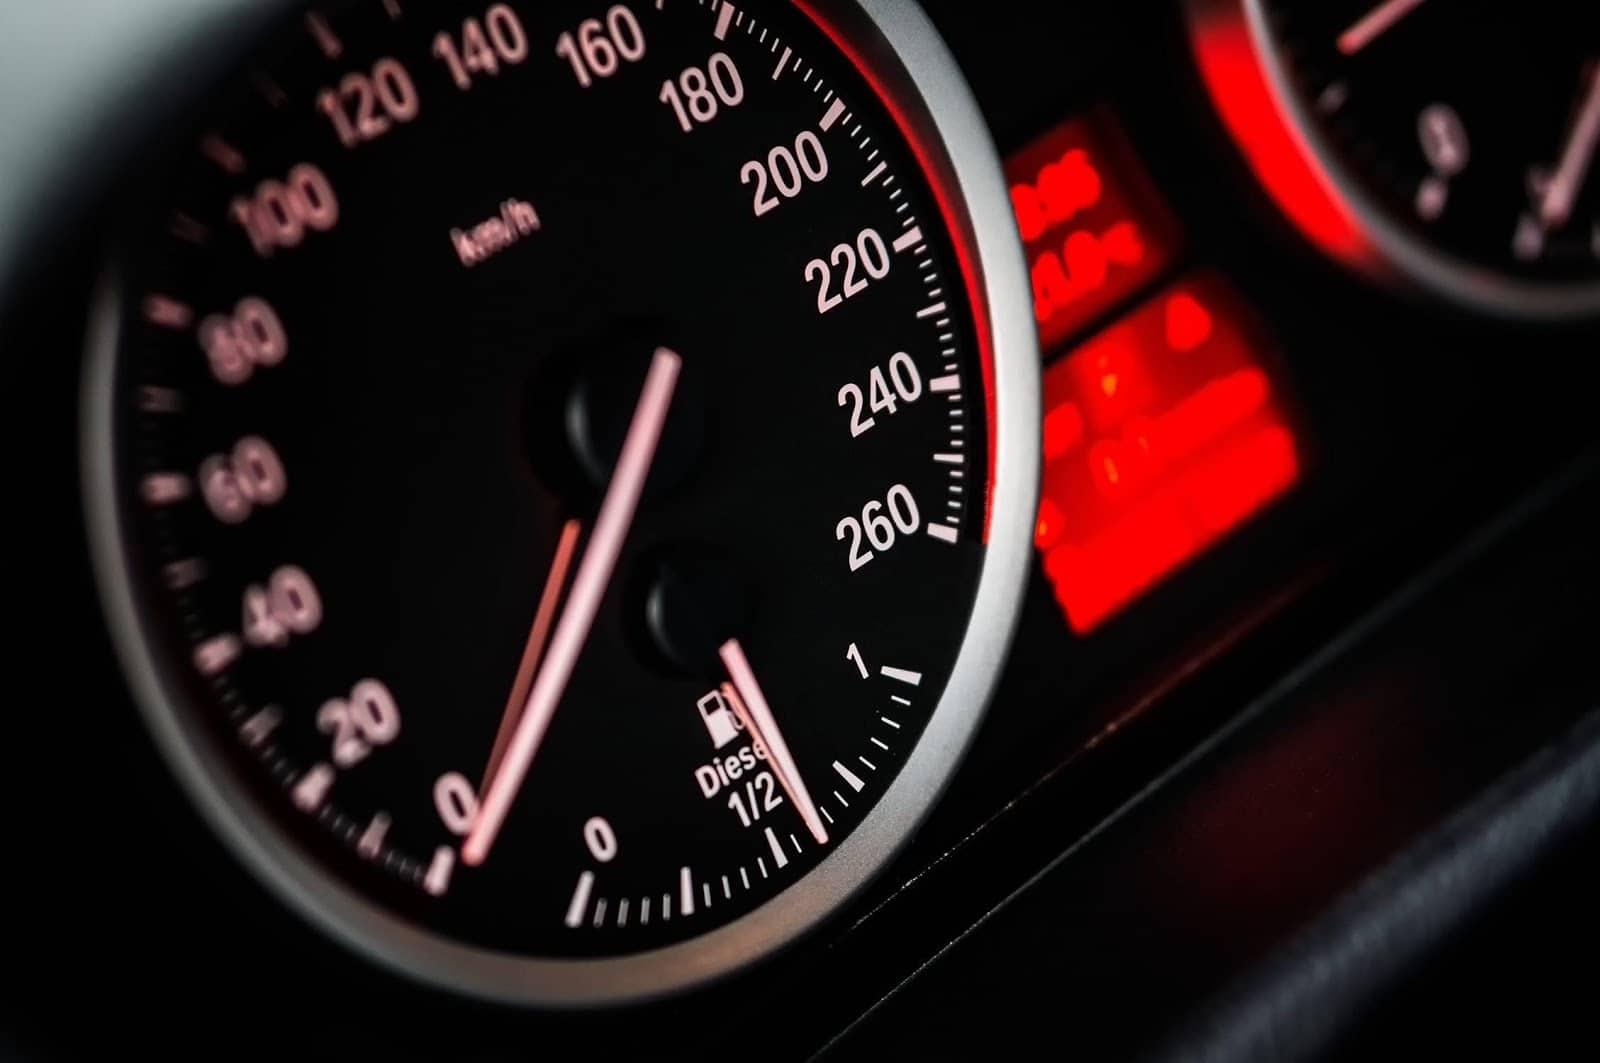 https://images.pexels.com/photos/104836/speed-car-vehicle-drive-104836.jpeg?auto=compress&cs=tinysrgb&dpr=2&h=750&w=1260